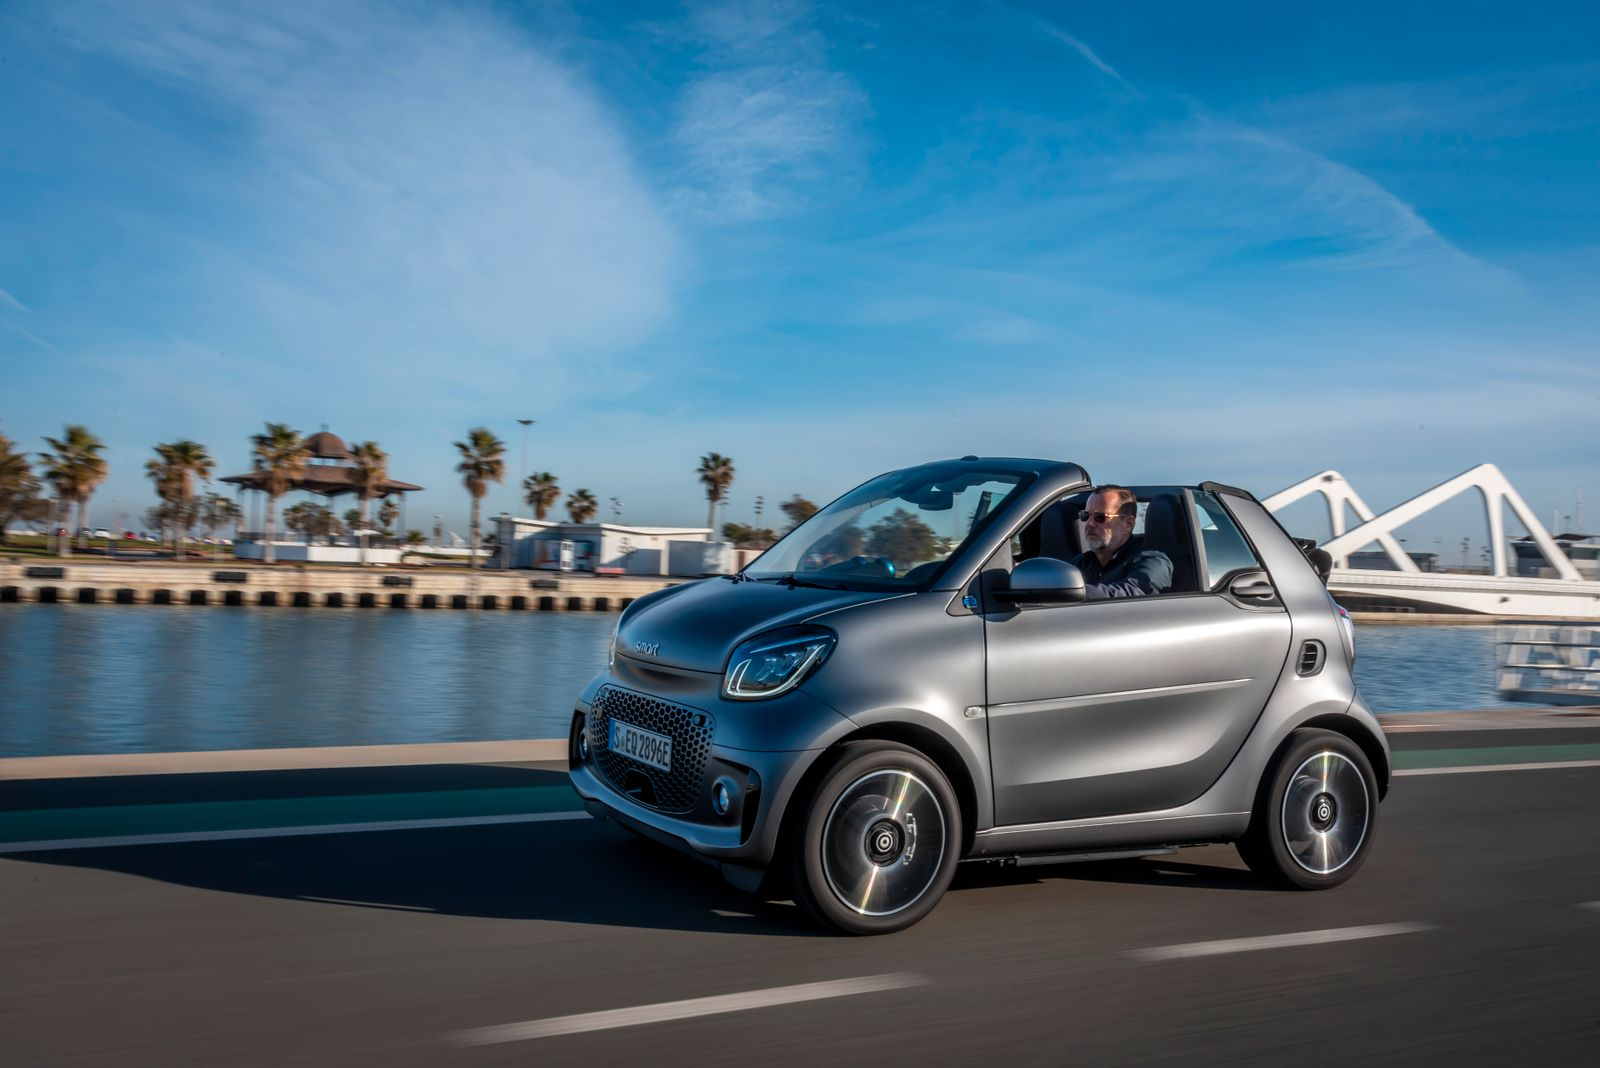 PTD smart EQ Valencia 2020